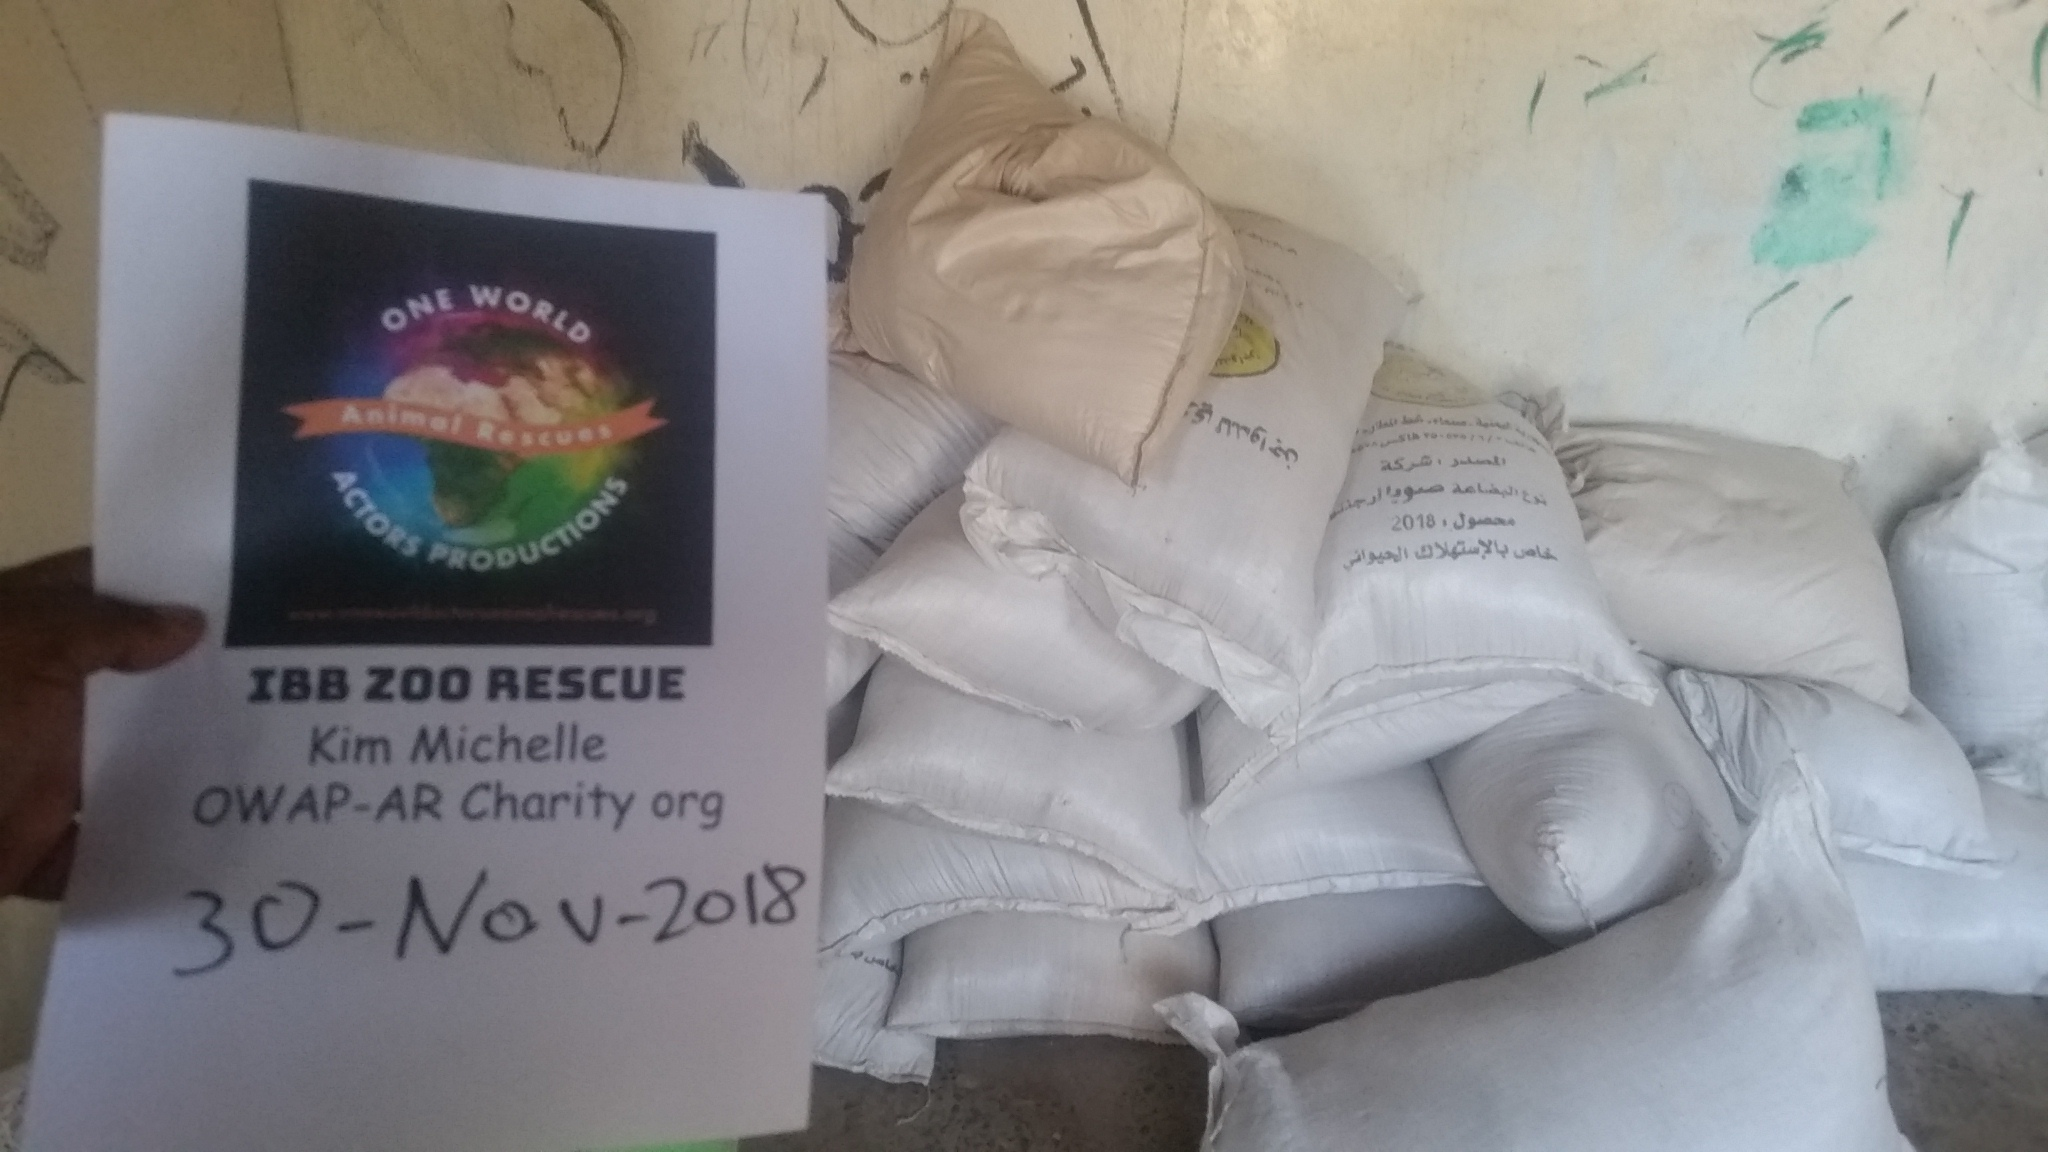 qrab unload of special horse feed by OWAP-AR 30 Nov 2018.jpg